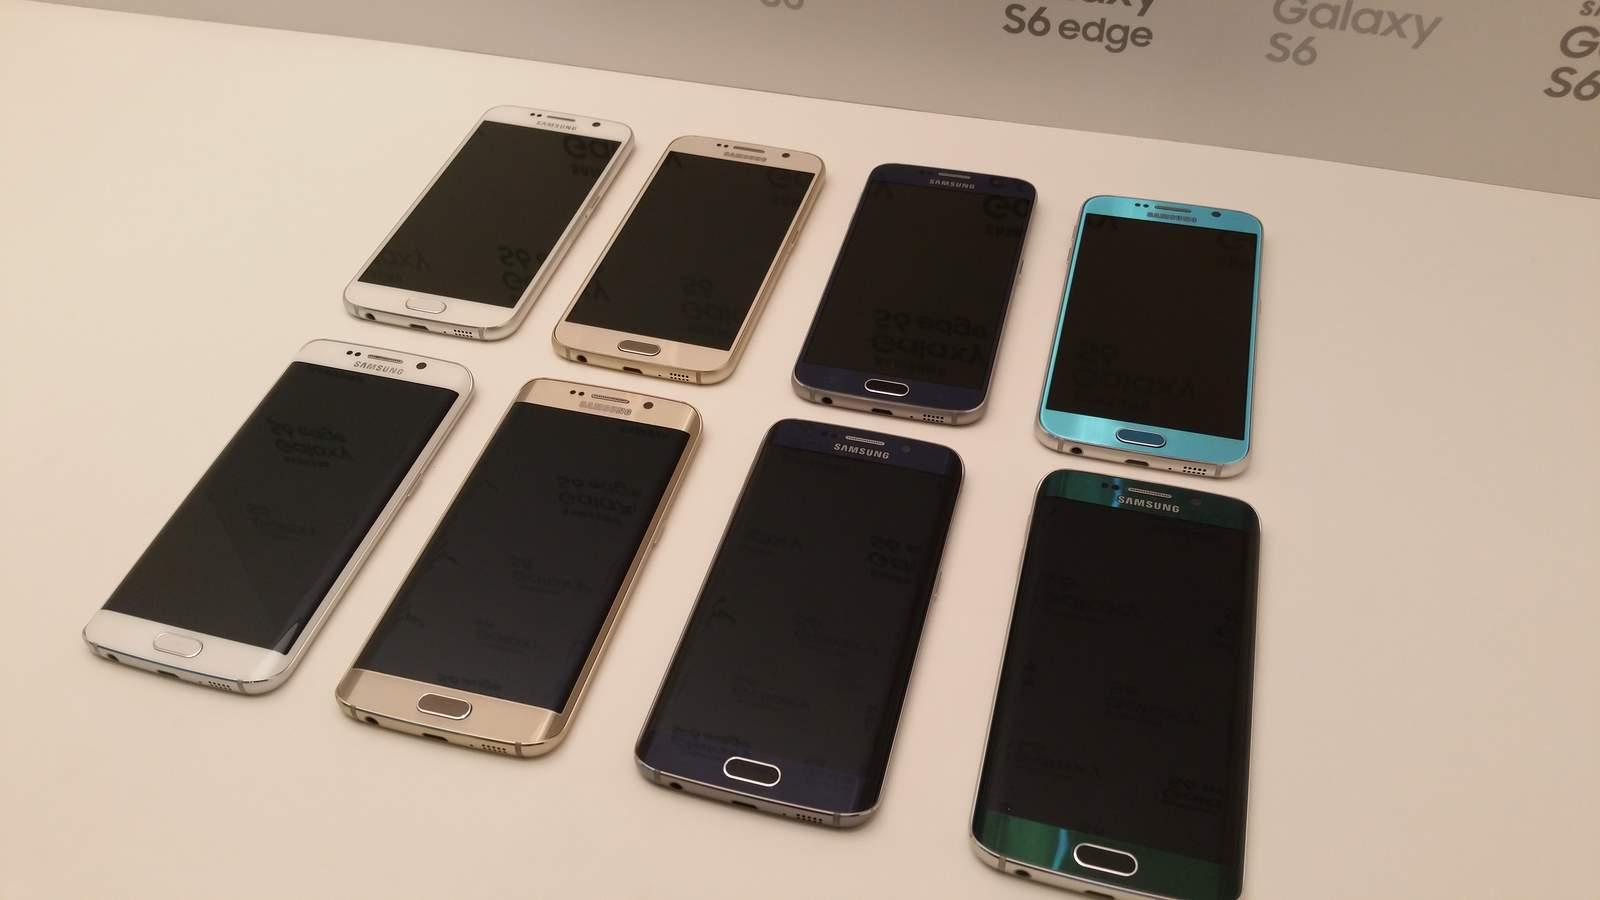 [MWC 2015] Prise en main des smartphones Samsung Galaxy S6 et Galaxy S6 Edge